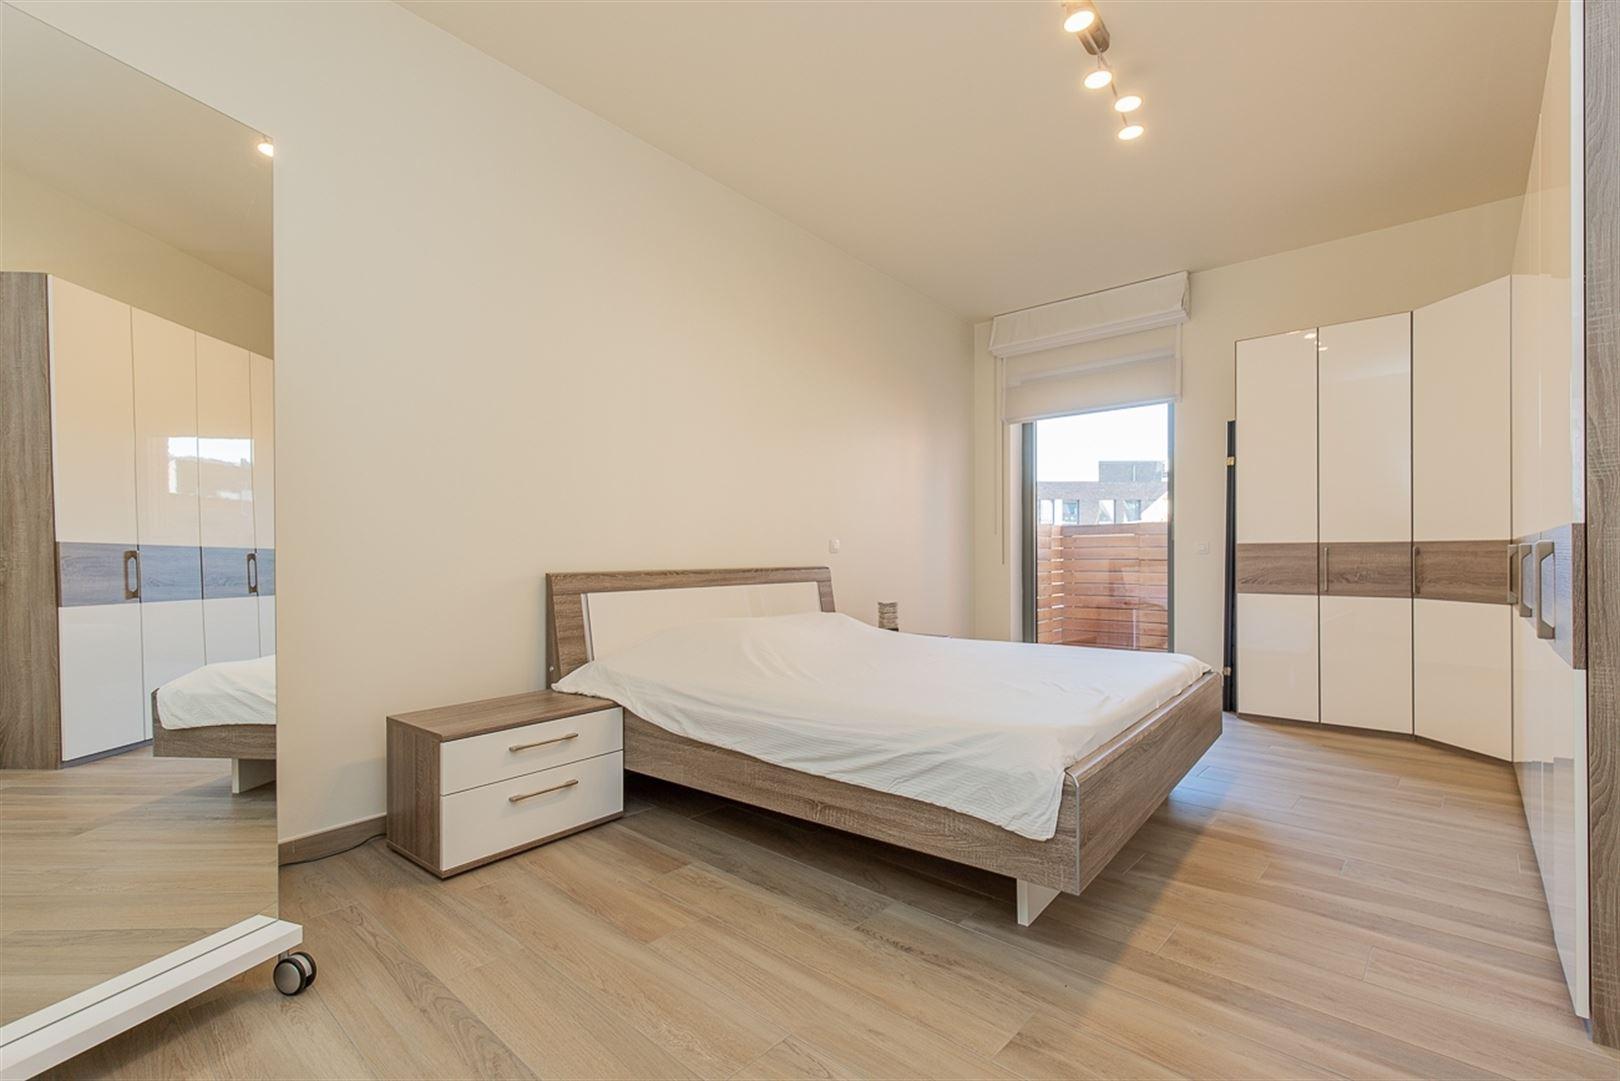 Foto 14 : Appartement te 9200 DENDERMONDE (België) - Prijs € 299.000